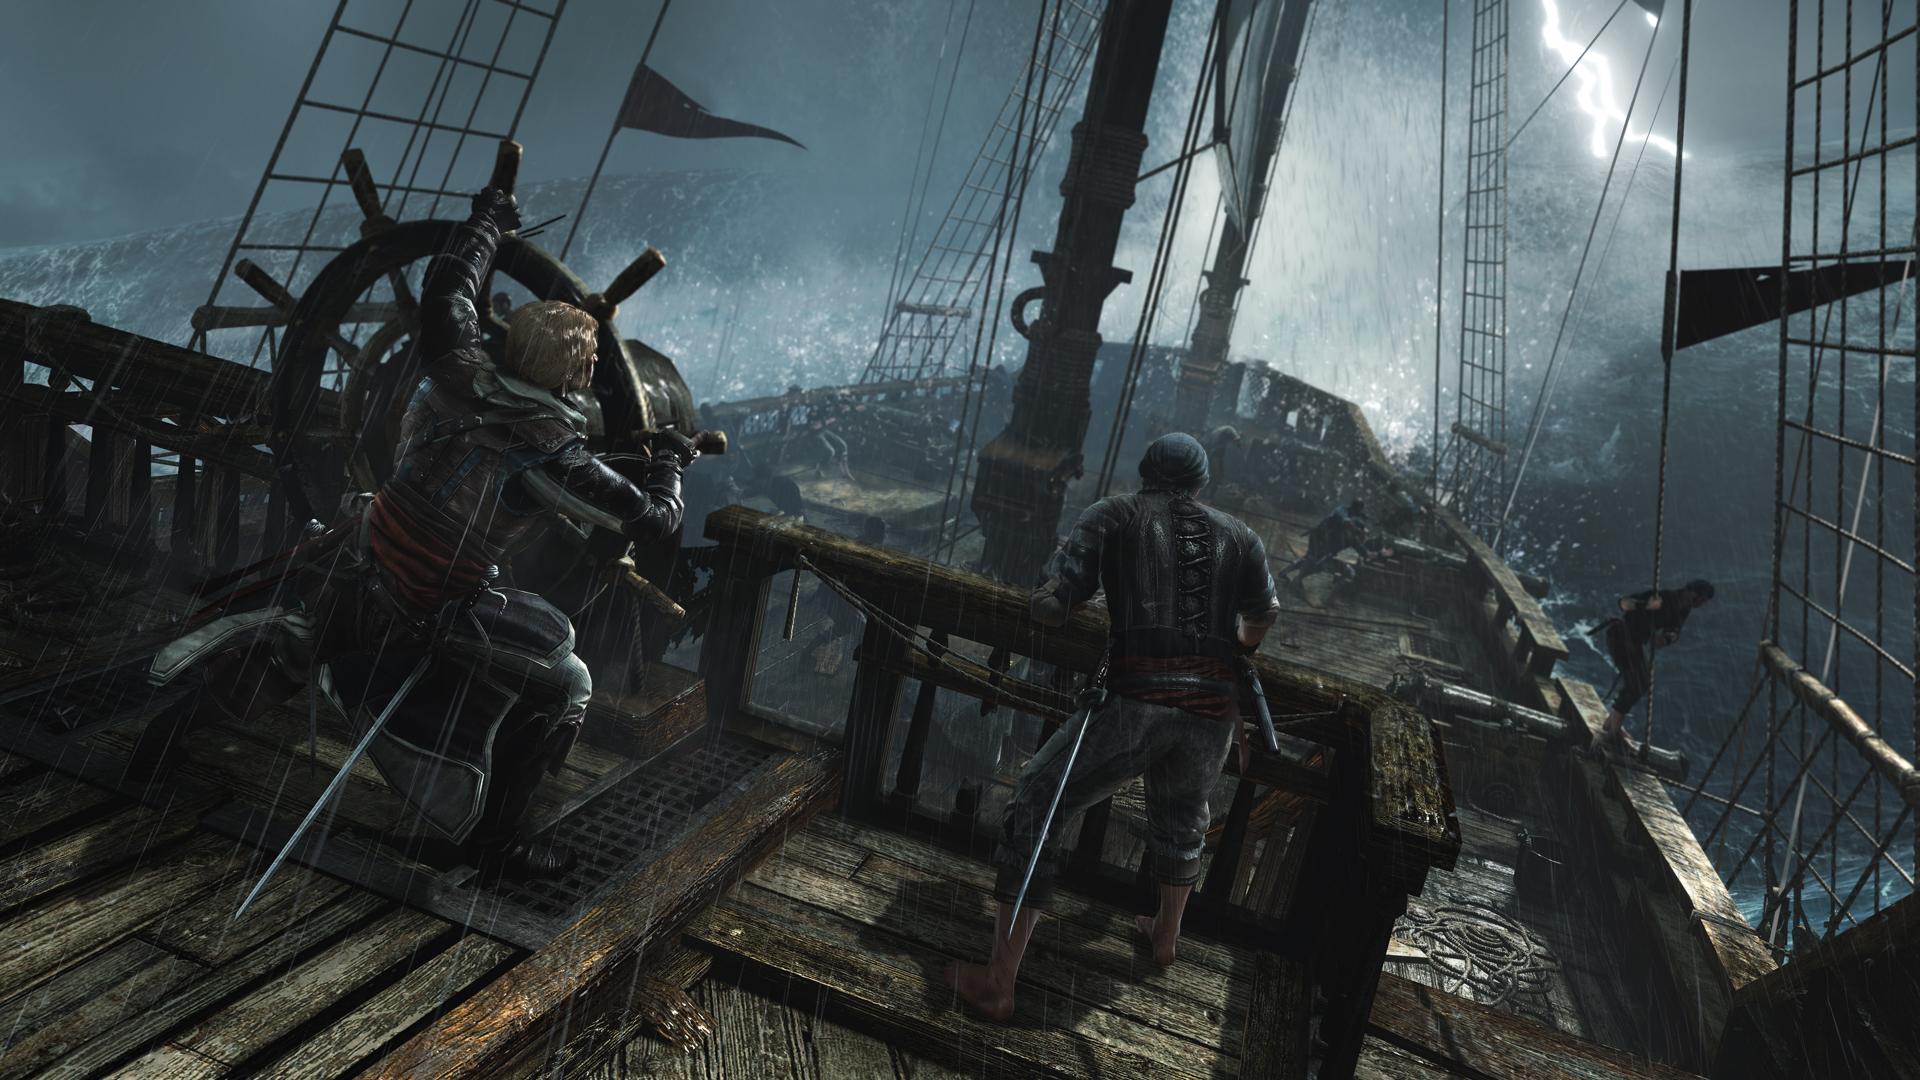 Group of Assassin S Creed 4 Black Flag Ship Combat Wallpaper